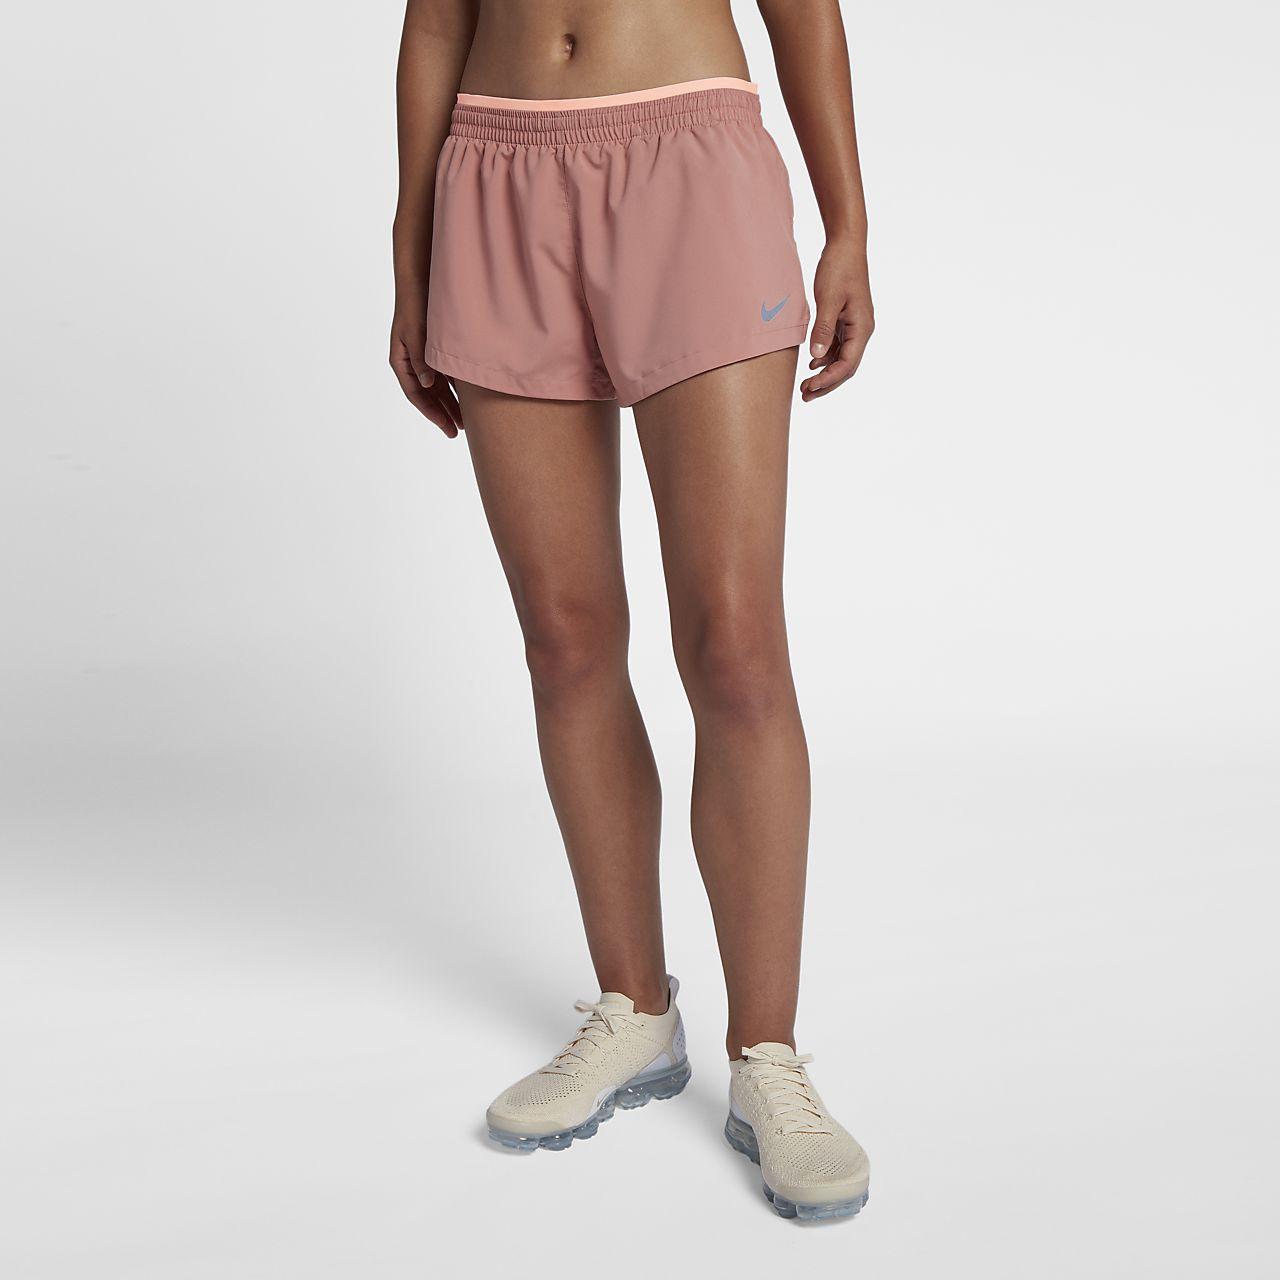 Nike Elevate Women's Track Running Shorts